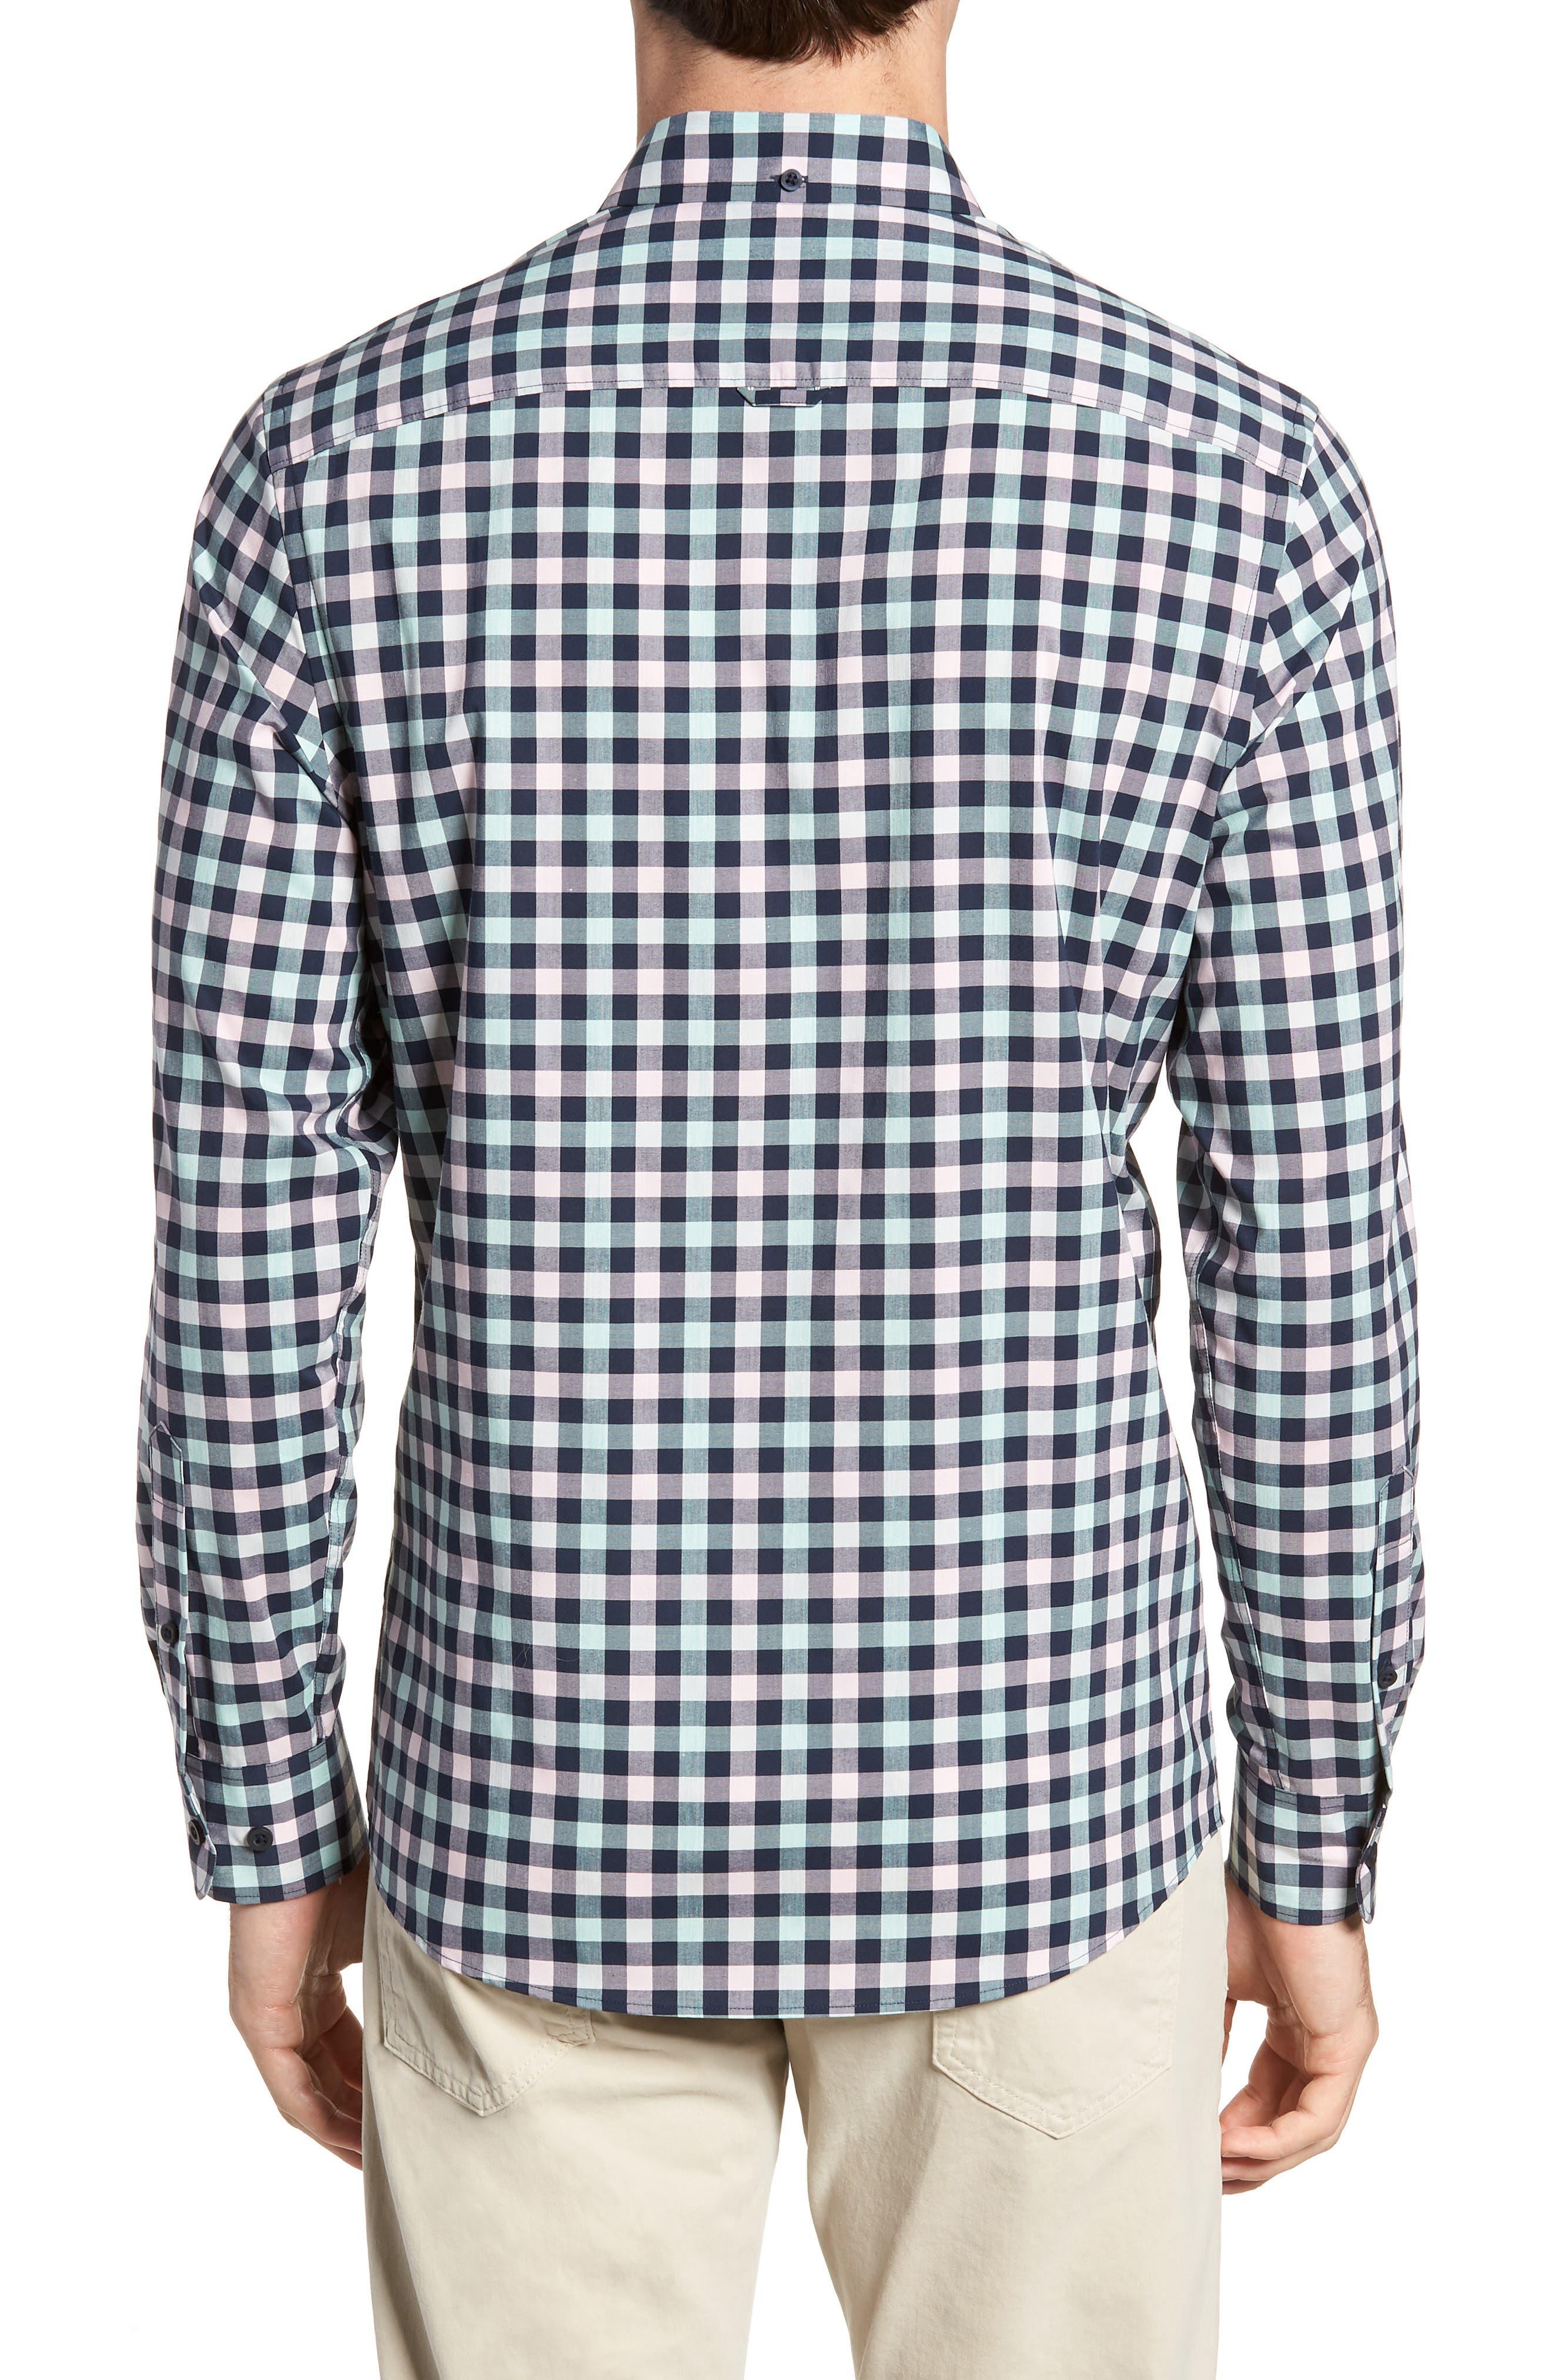 Tech-Smart Trim Fit Check Sport Shirt,                             Alternate thumbnail 3, color,                             Navy Iris Teal Check